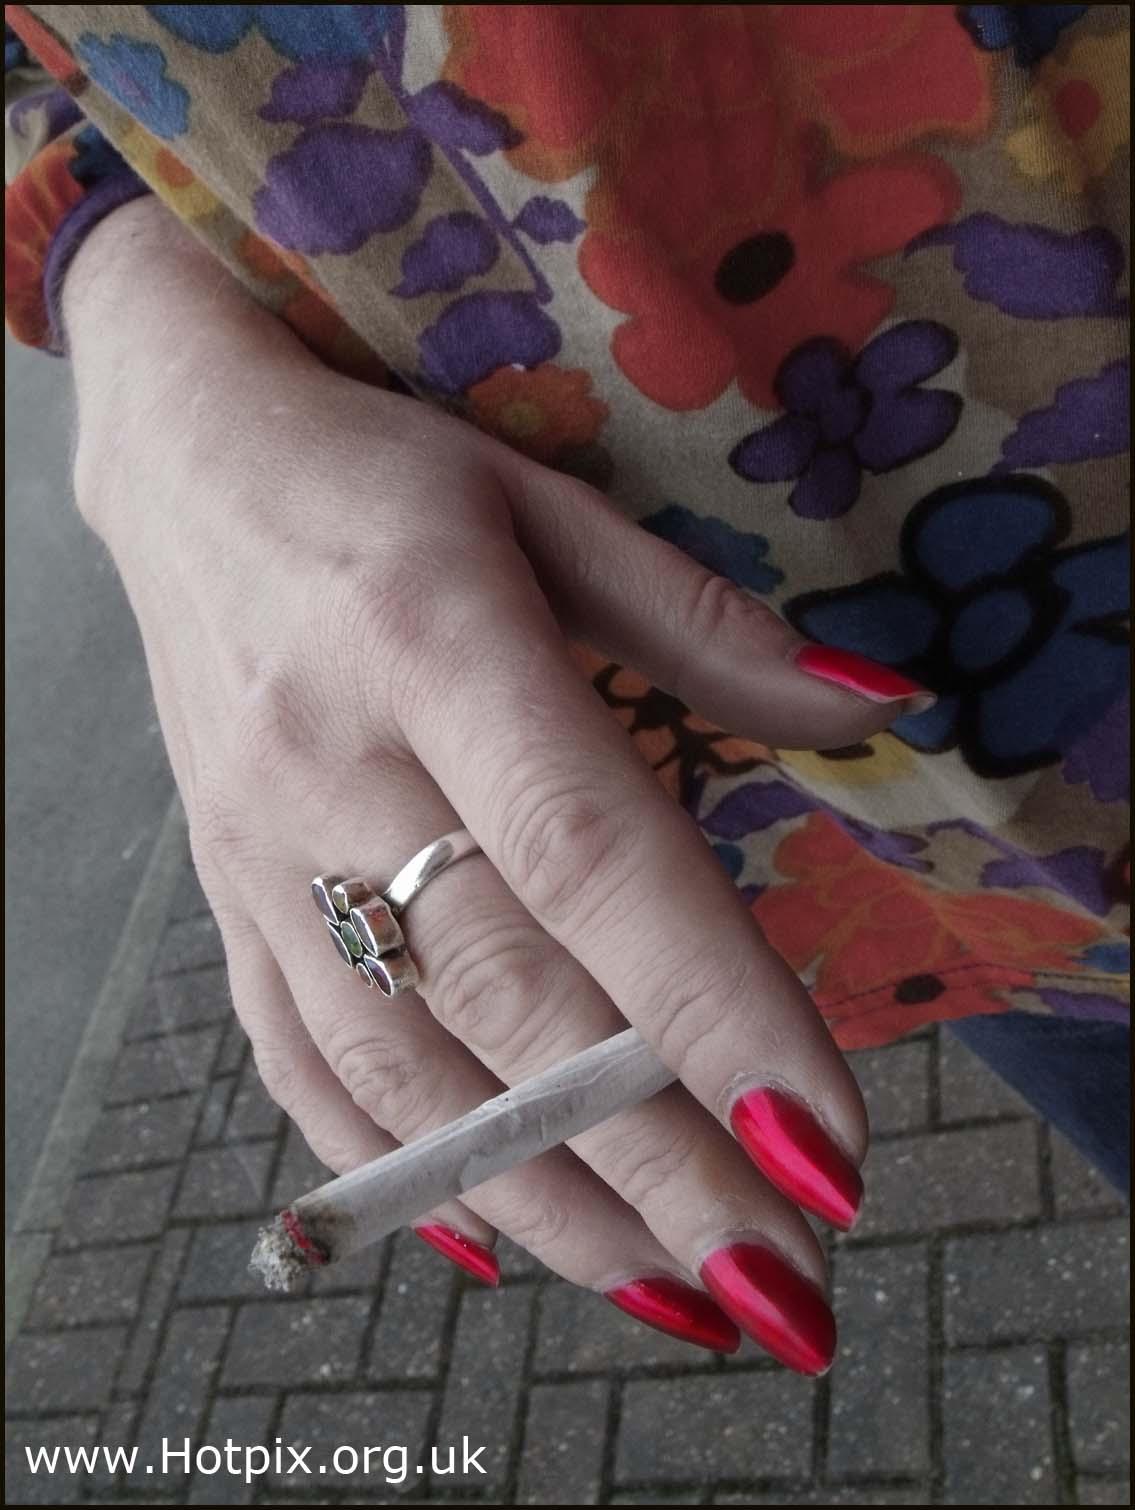 rizla,tobacco,smoke,smoker,smoking,ban,roll,up,rollup,handmade,hand,made,cigarette,uk,england,britain,red,nails,lady,woman,female,Di,M,DianeM,Diane,sex,sexy,mathews,matthews,muchacha,femenina,de,la,mujer,se\u00f1ora,girl,\u5973\u6027\u30e1\u30b9\u306e\u5973\u6027\u306e\u5973\u306e\u5b50,\u592b\u4eba\u5973\u6027\u5987\u5973\u5973\u5b69,fille,f\u00e9minine,femme,dame,hotpix!